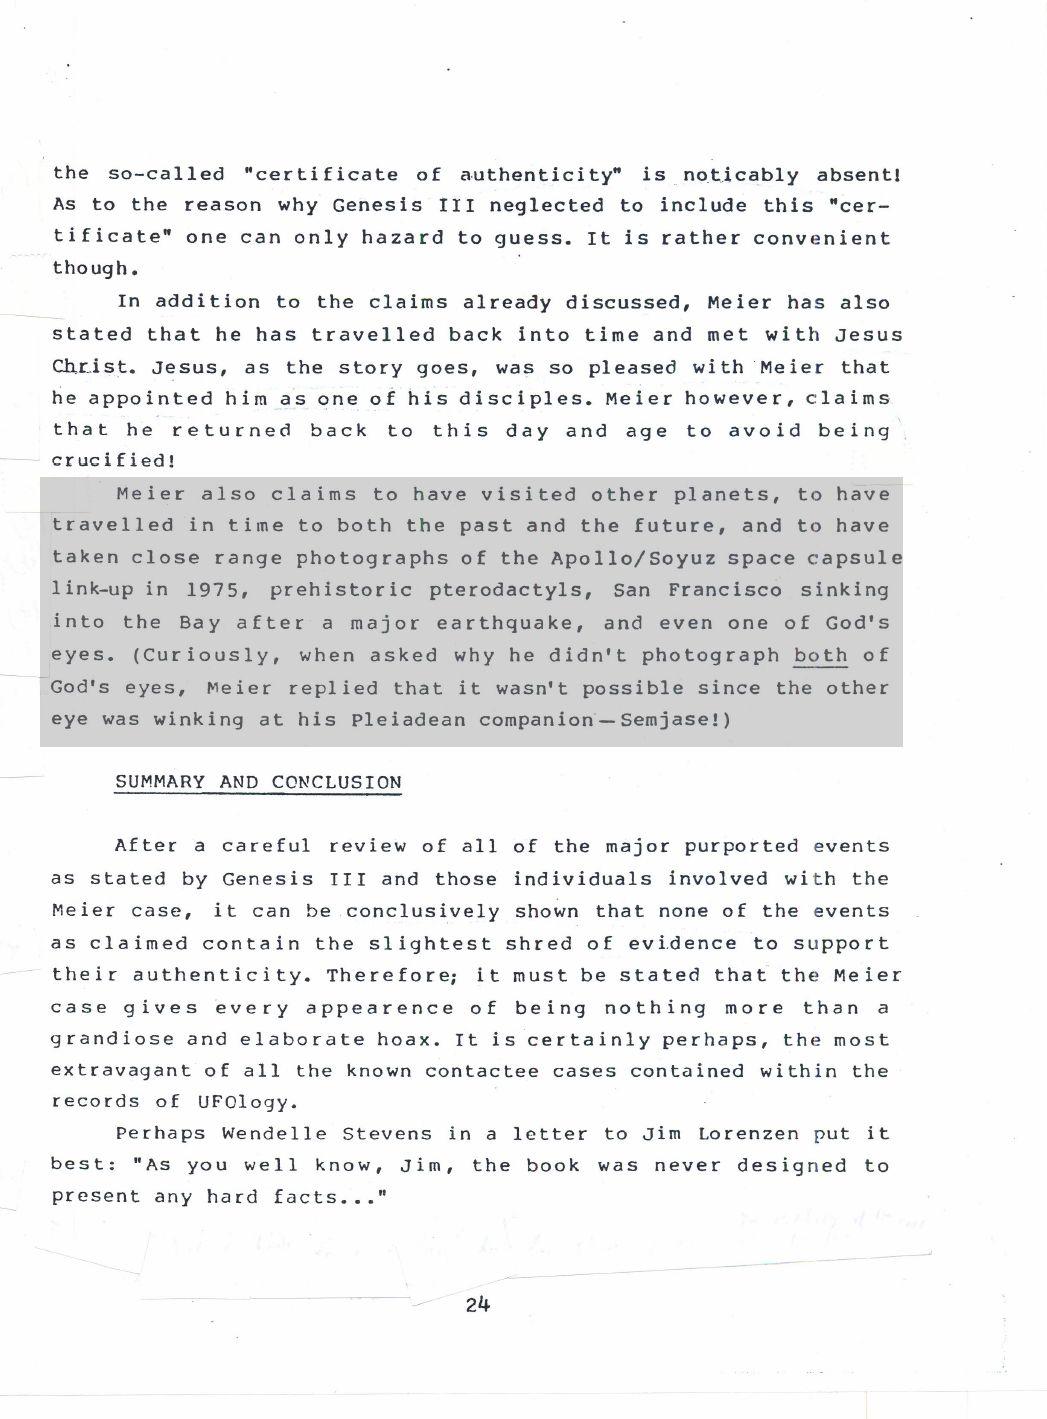 TMI - pg 24 - Ring Nebula